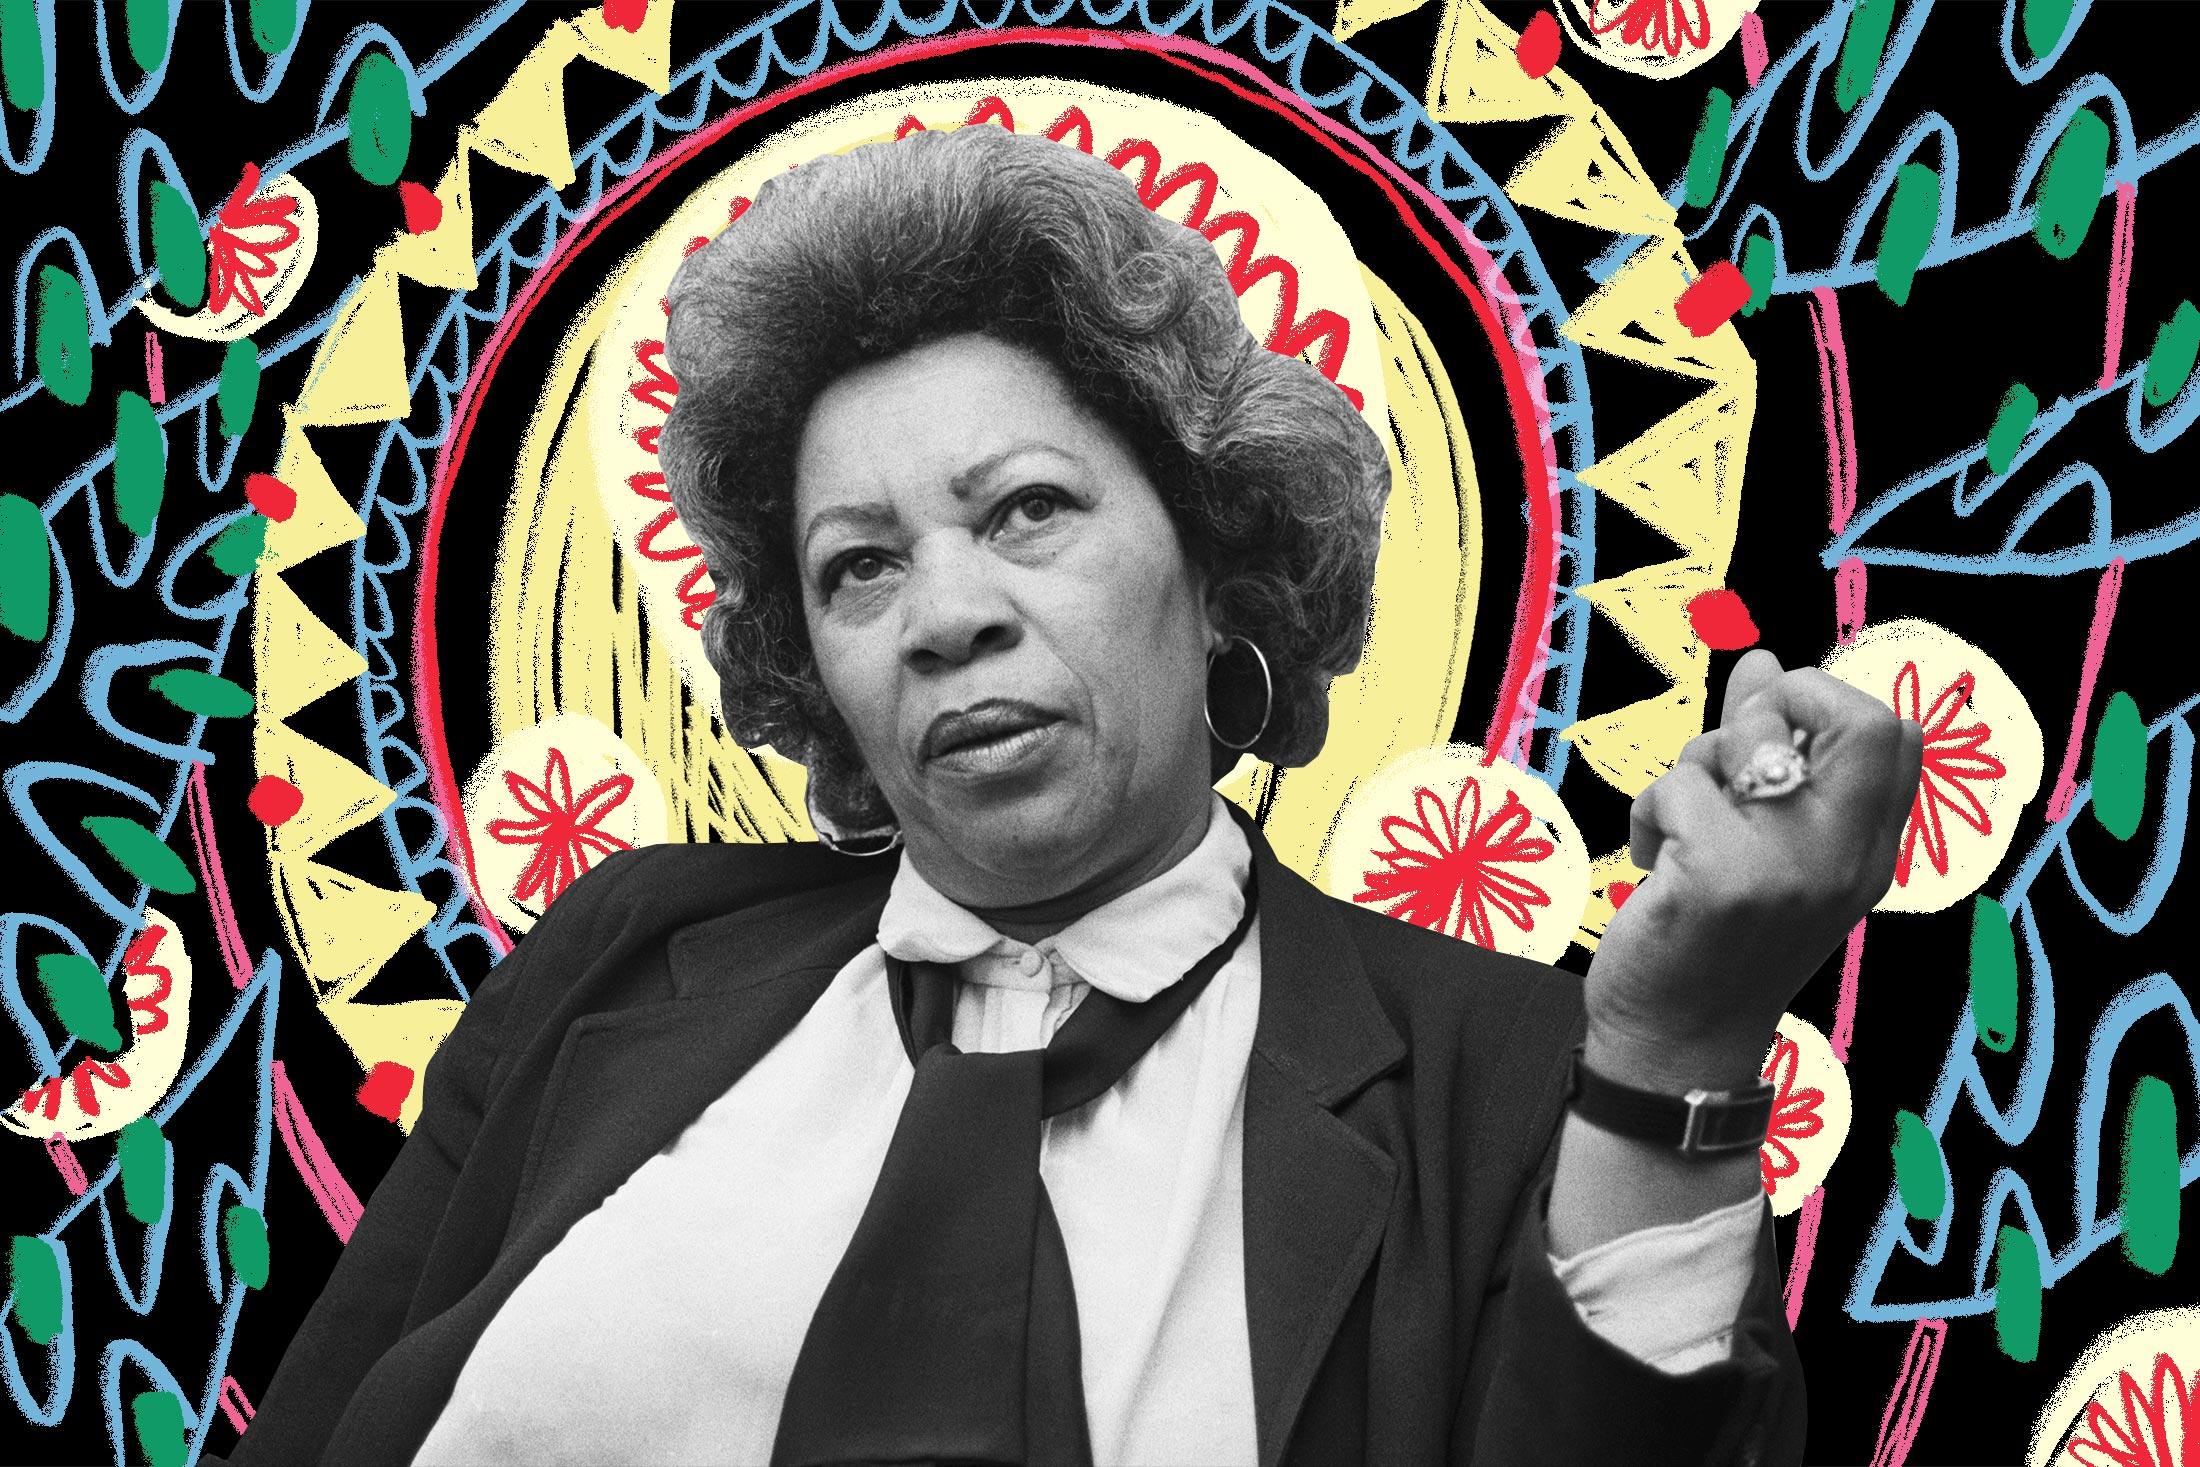 Toni Morrison on a patterned and radiant dark backdrop.